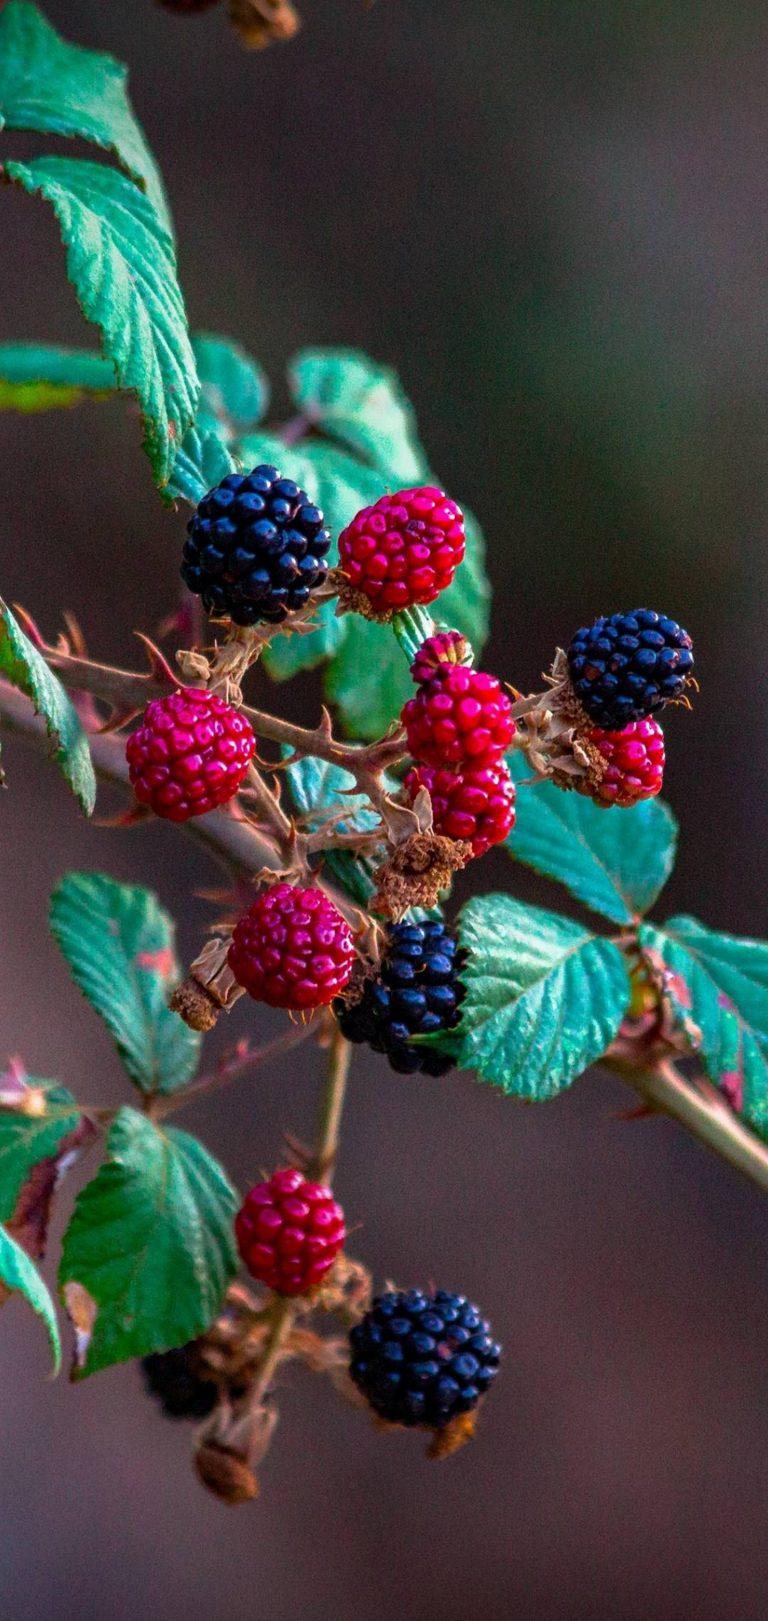 Fruits Raspberry Blackberry Wallpaper 1440x3040 768x1621